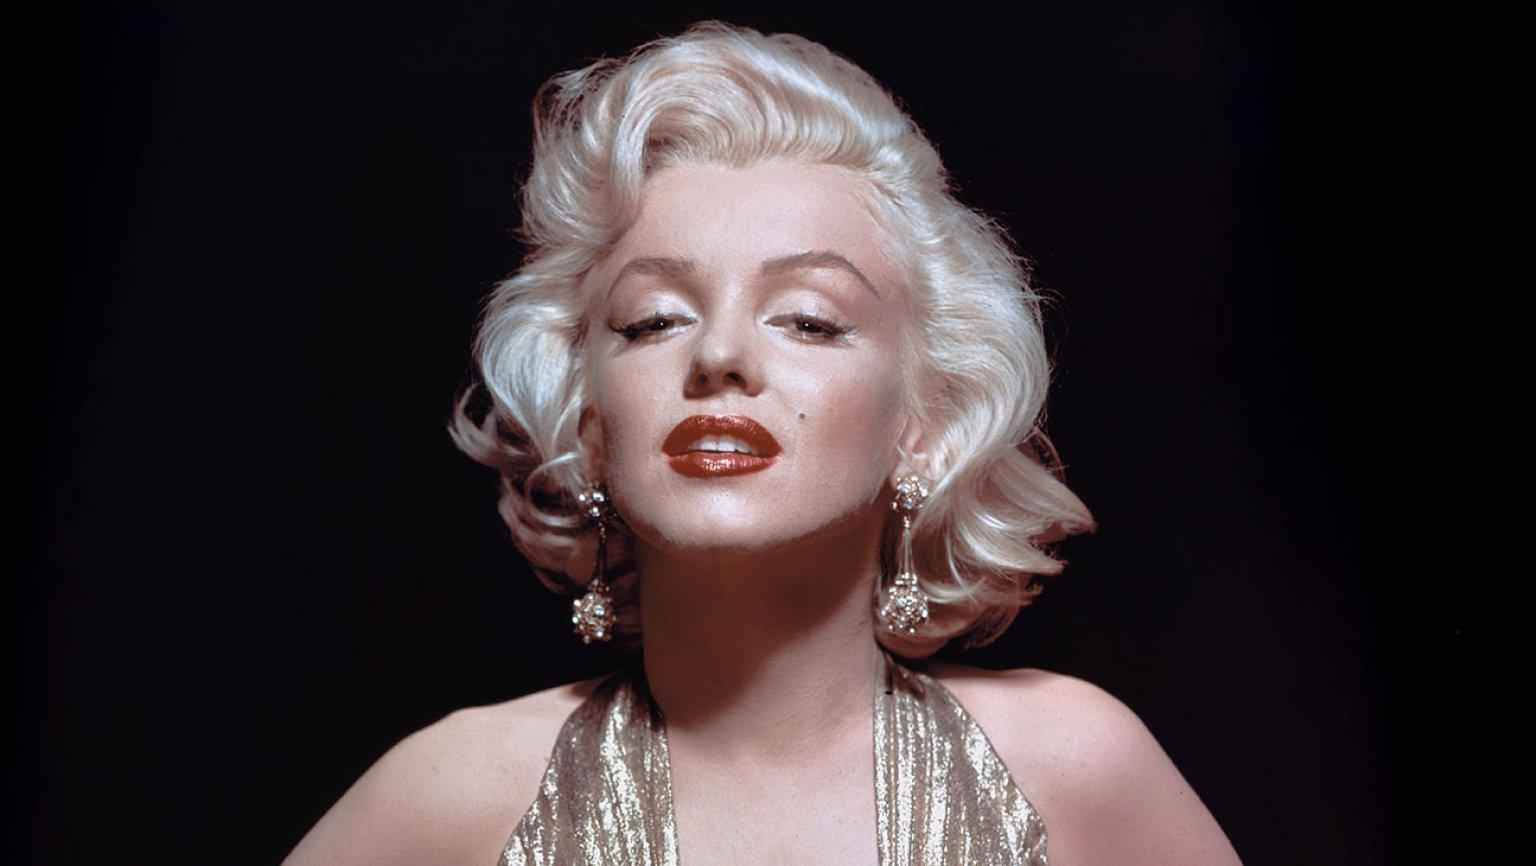 Triathlon Governare tramonto  The Jewish Marilyn Monroe – Gone but Not Forgotten - Atlanta ...